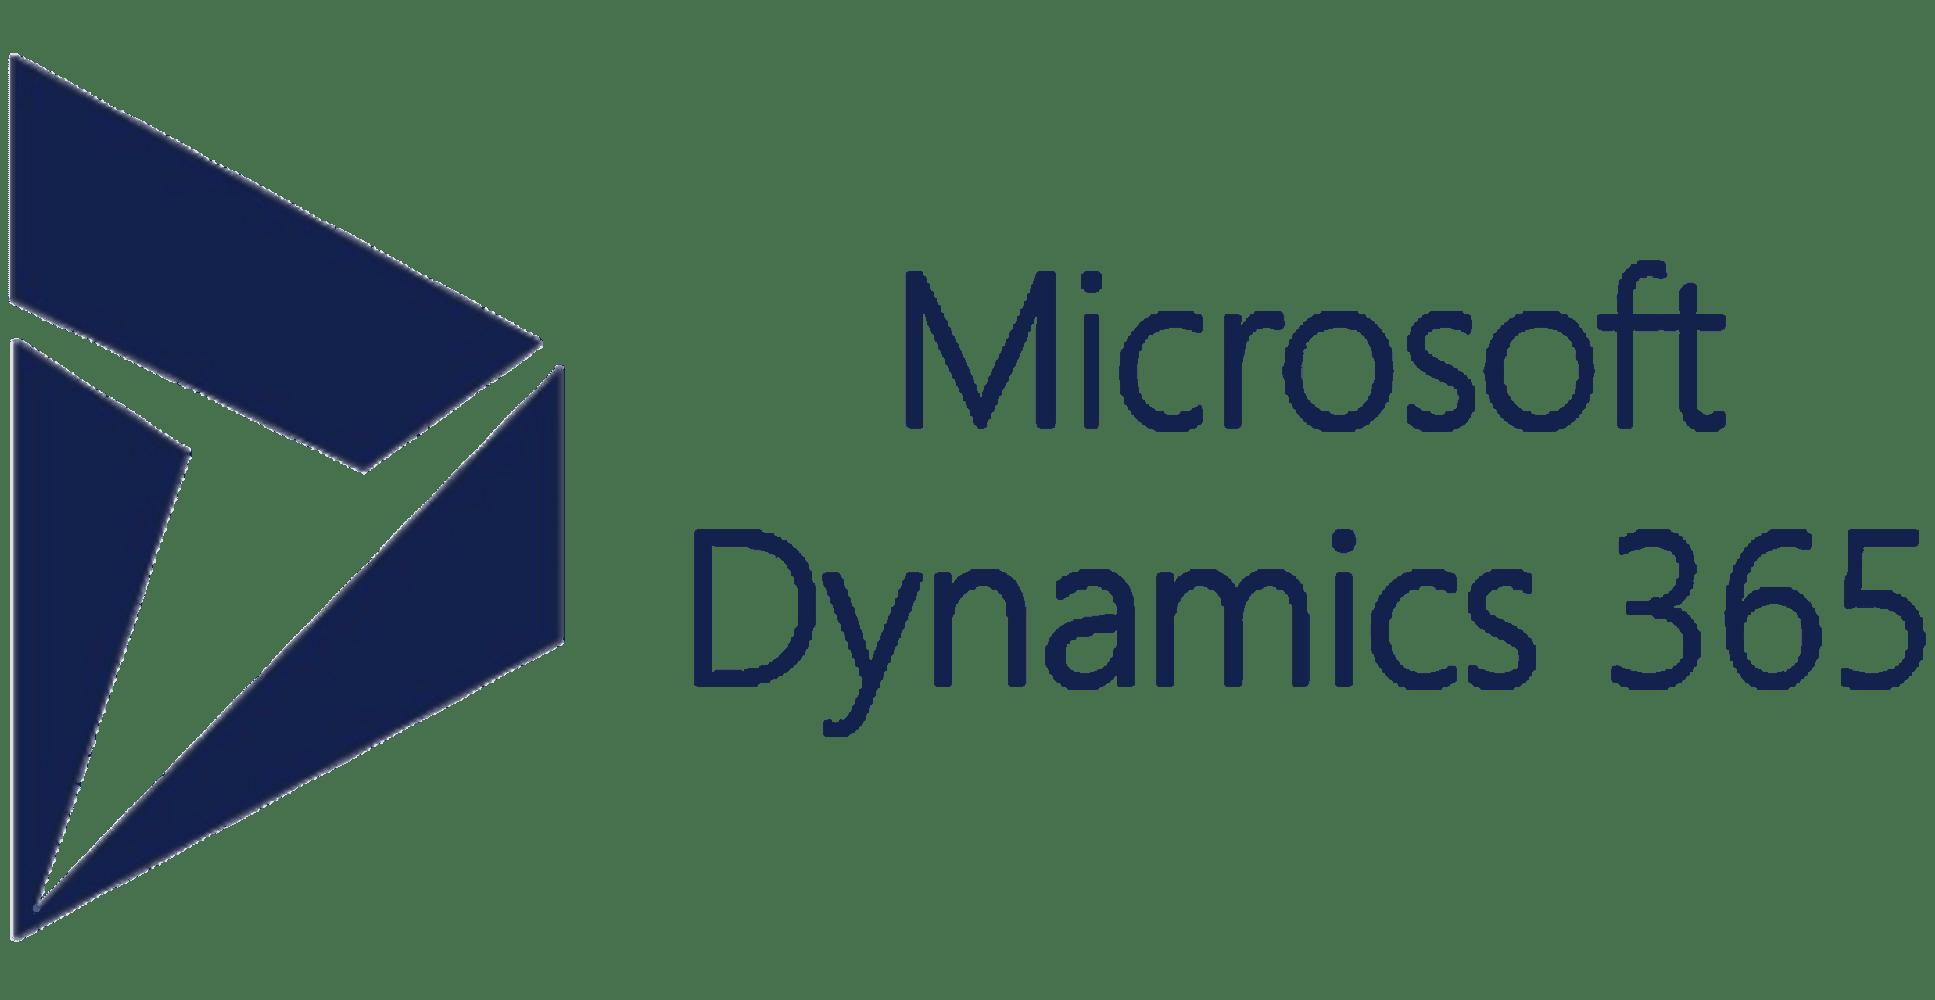 Microsoft-Dynamics Logo